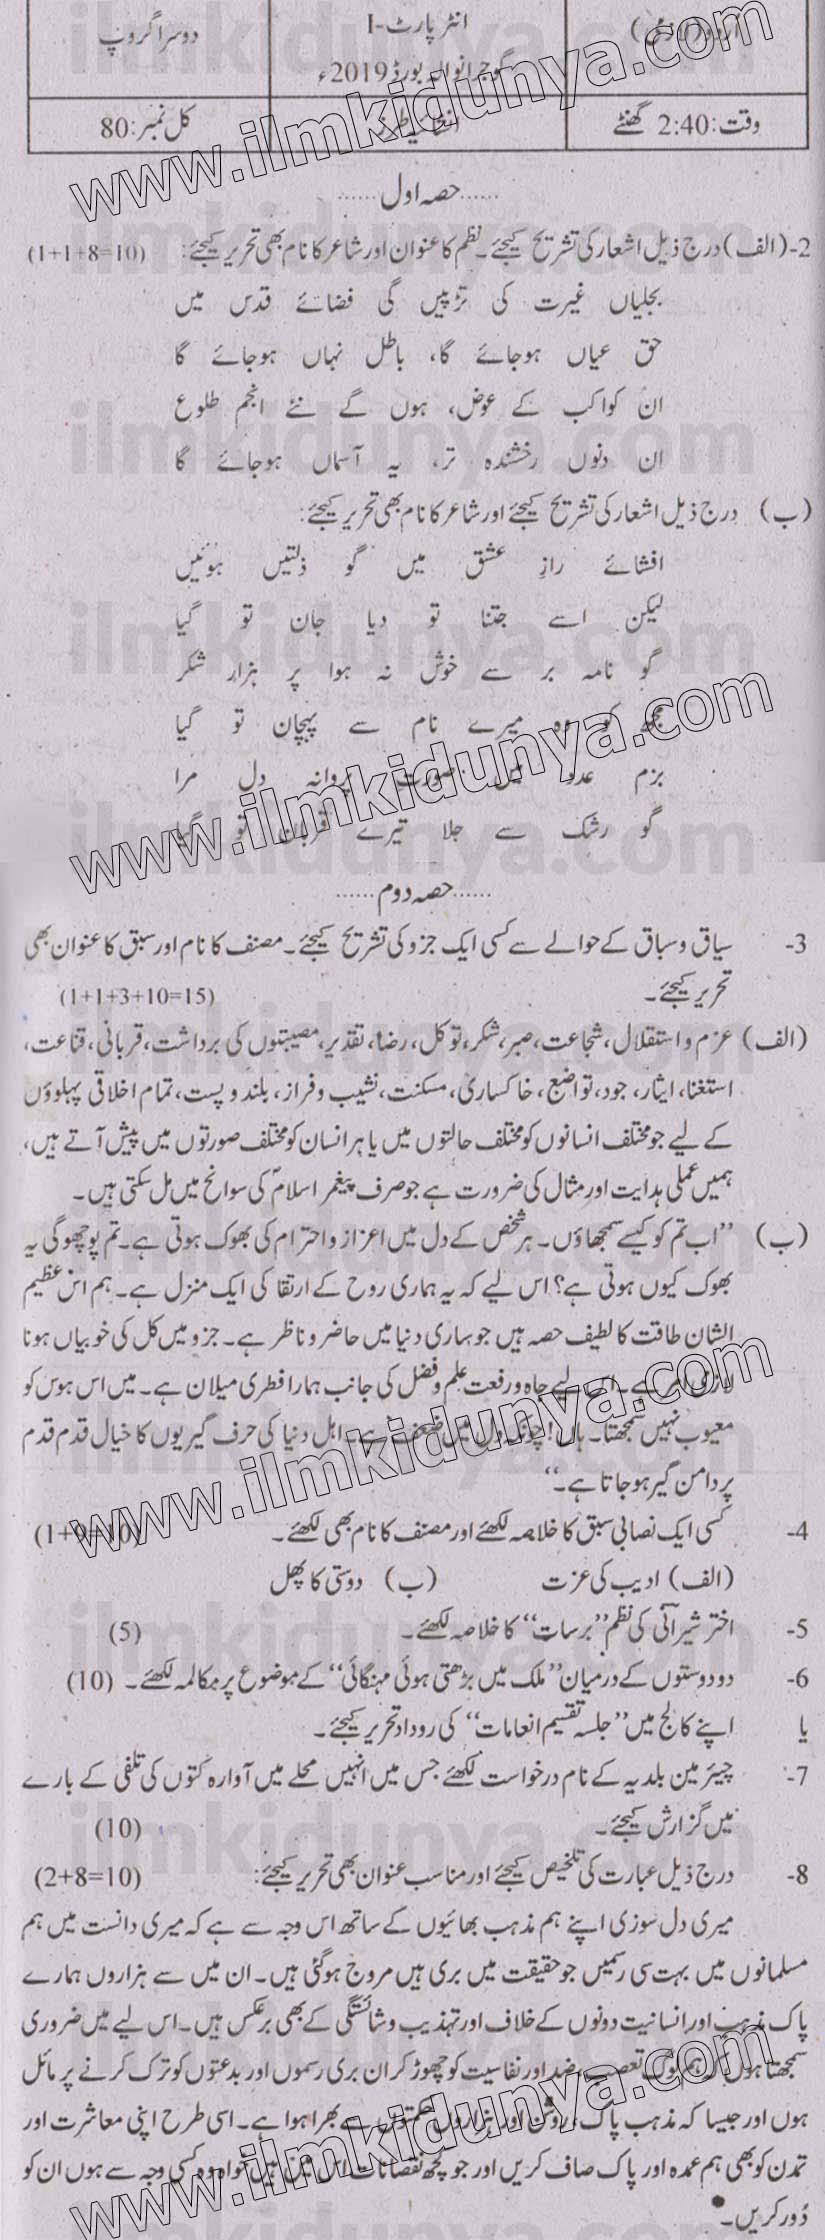 Past Paper 2019 Gujranwala Board Inter Part 1 Urdu